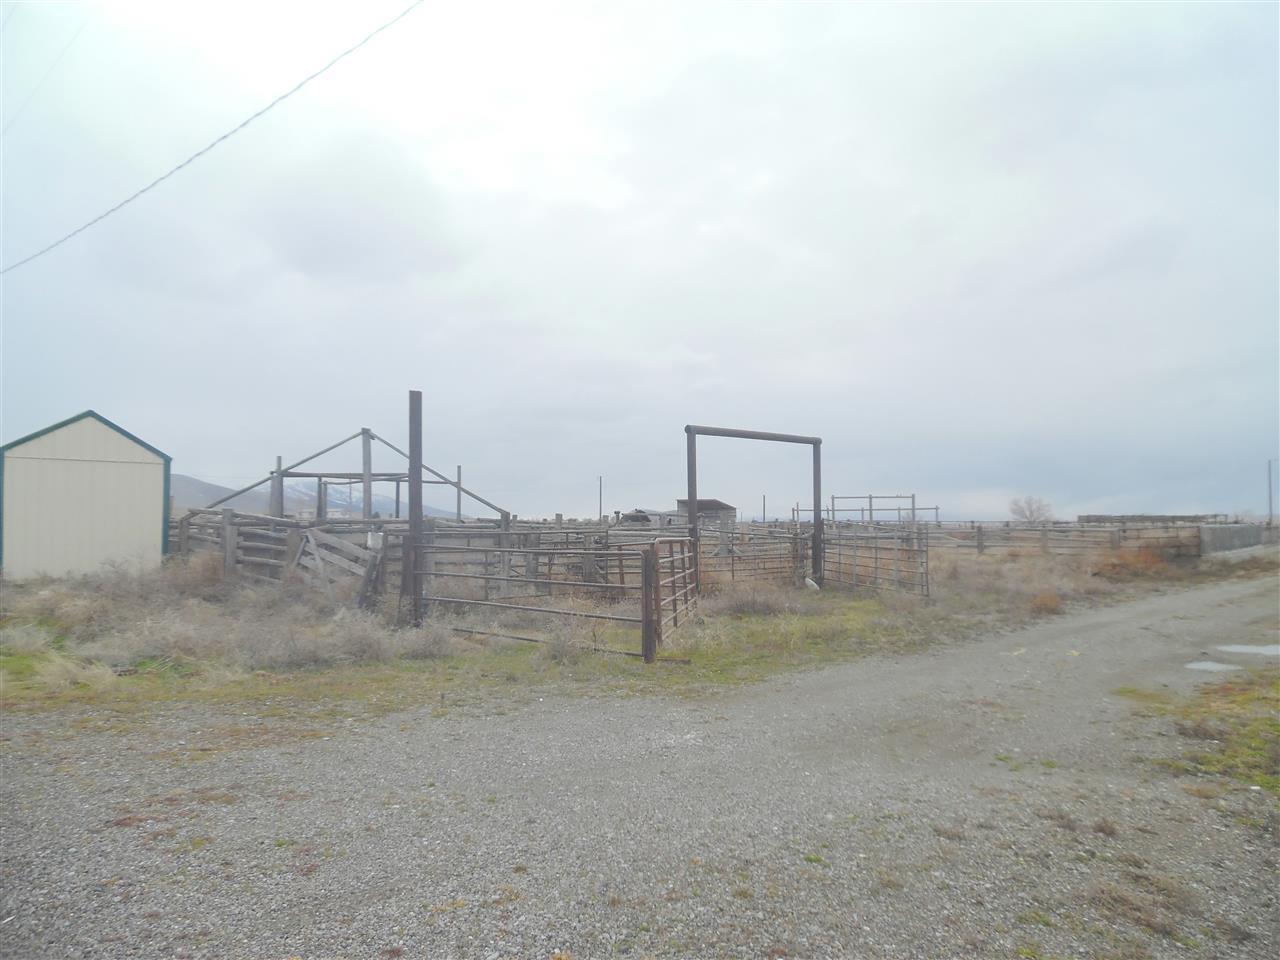 Ranch for Sale at 1100 E 150 s 1100 E 150 s Declo, Idaho 83323